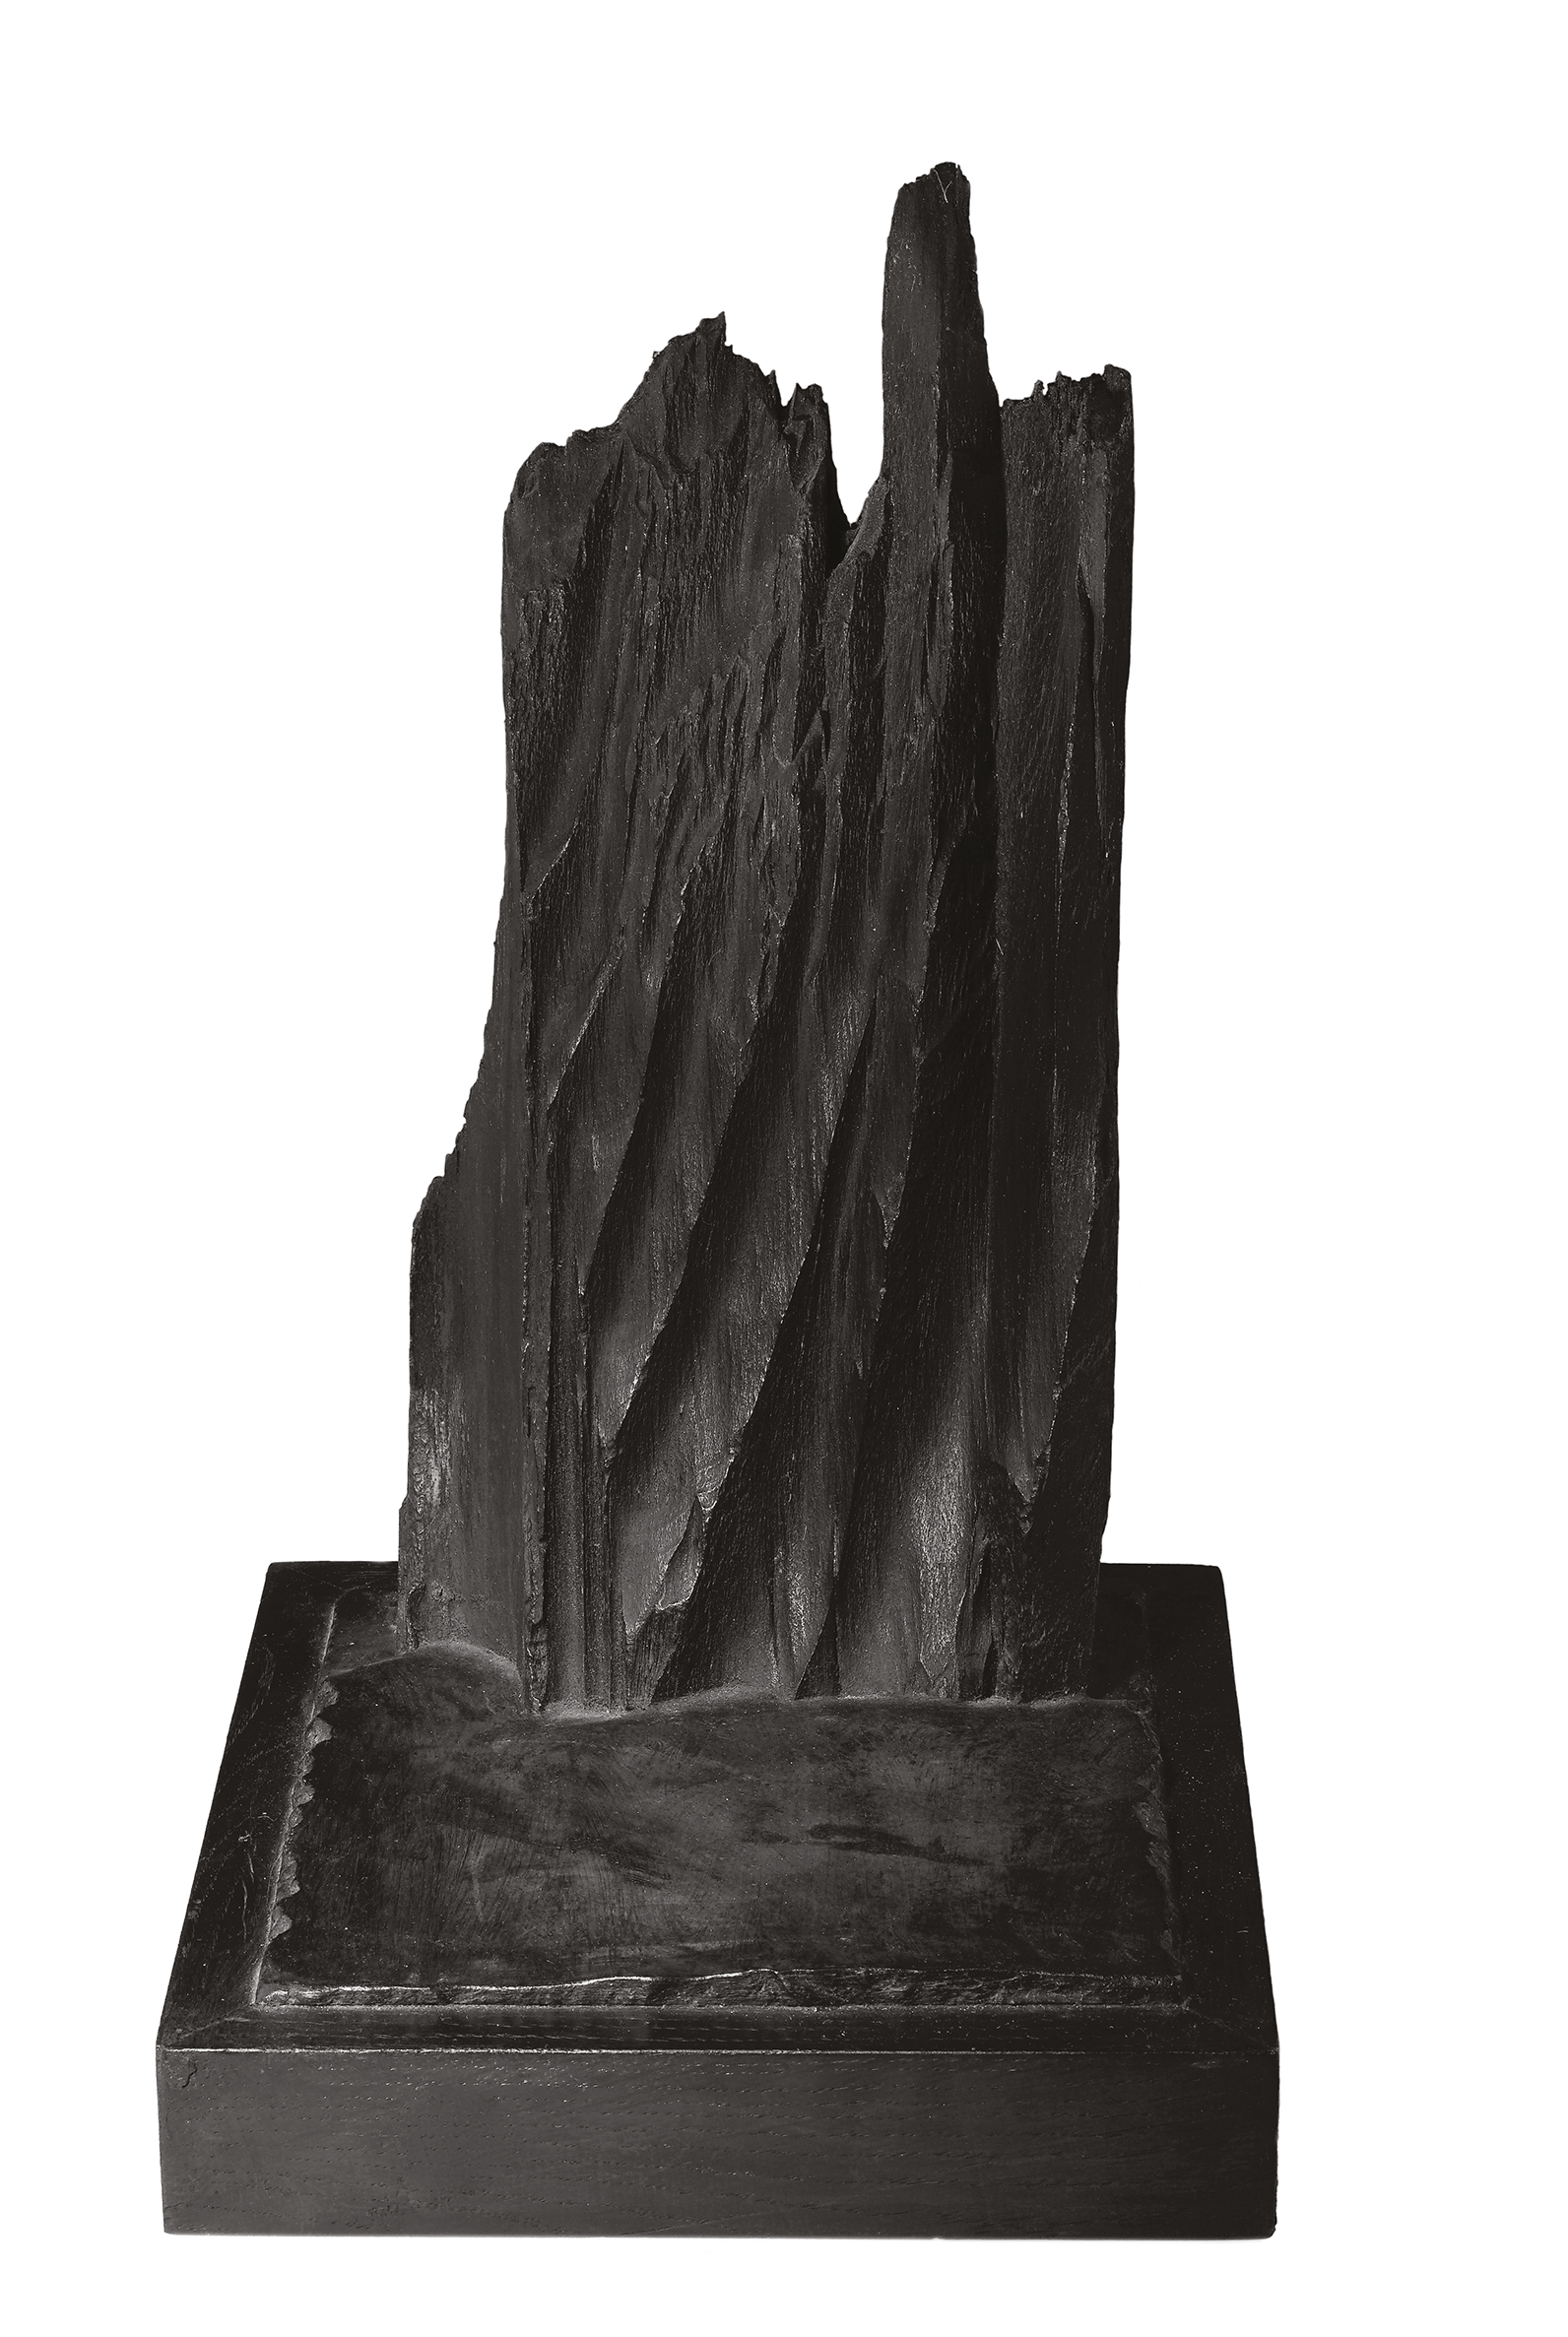 La falaise mazoutée  — H 48 cm - L 26x26 cm